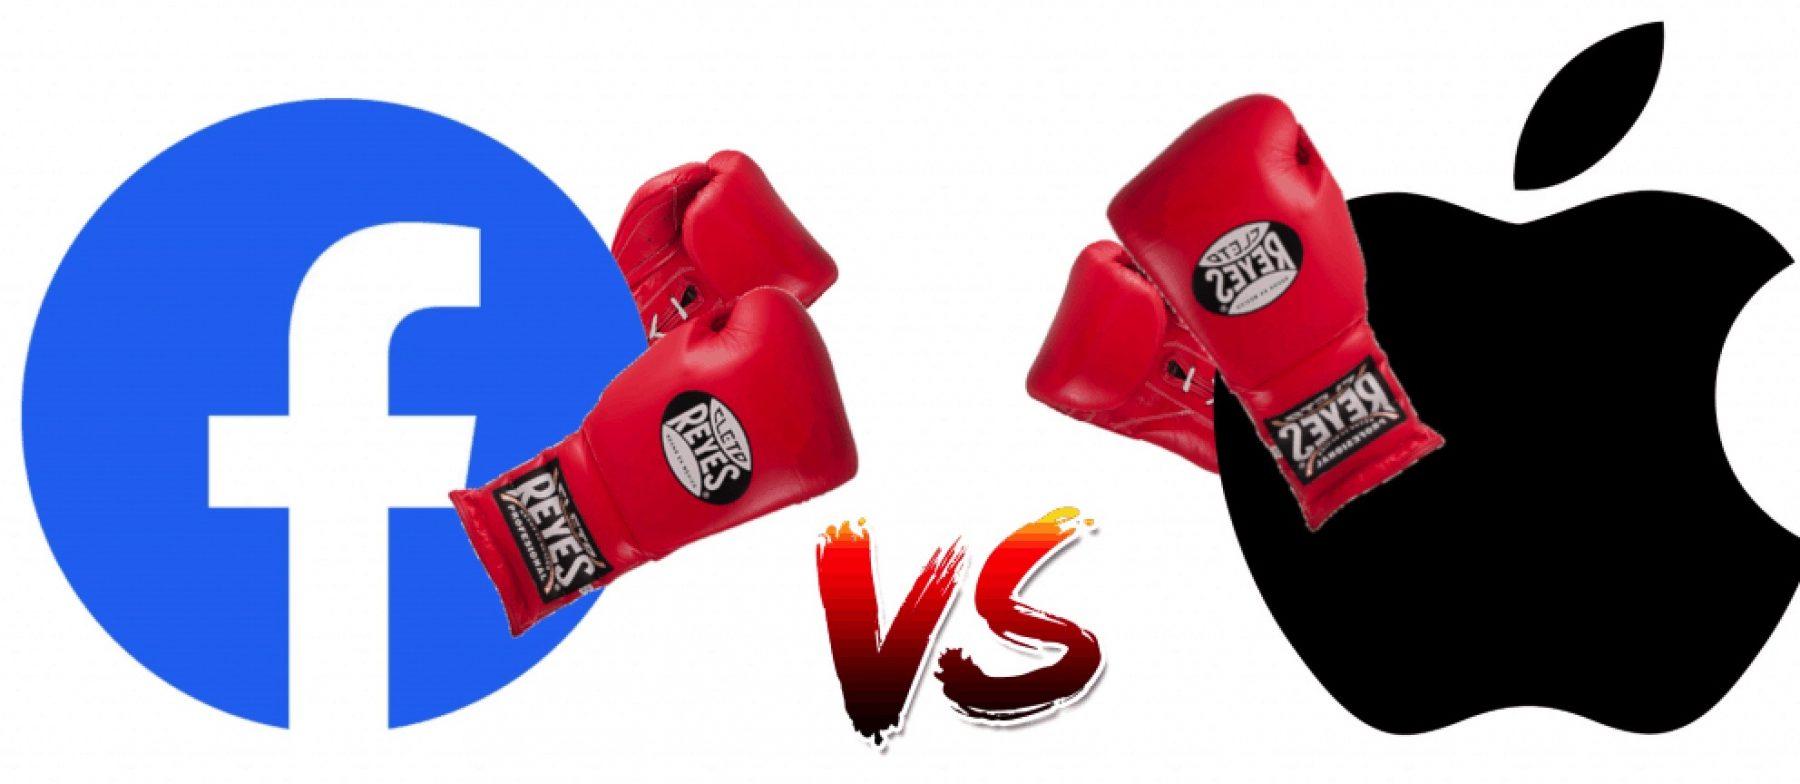 Its war! Facebook vs. Apple